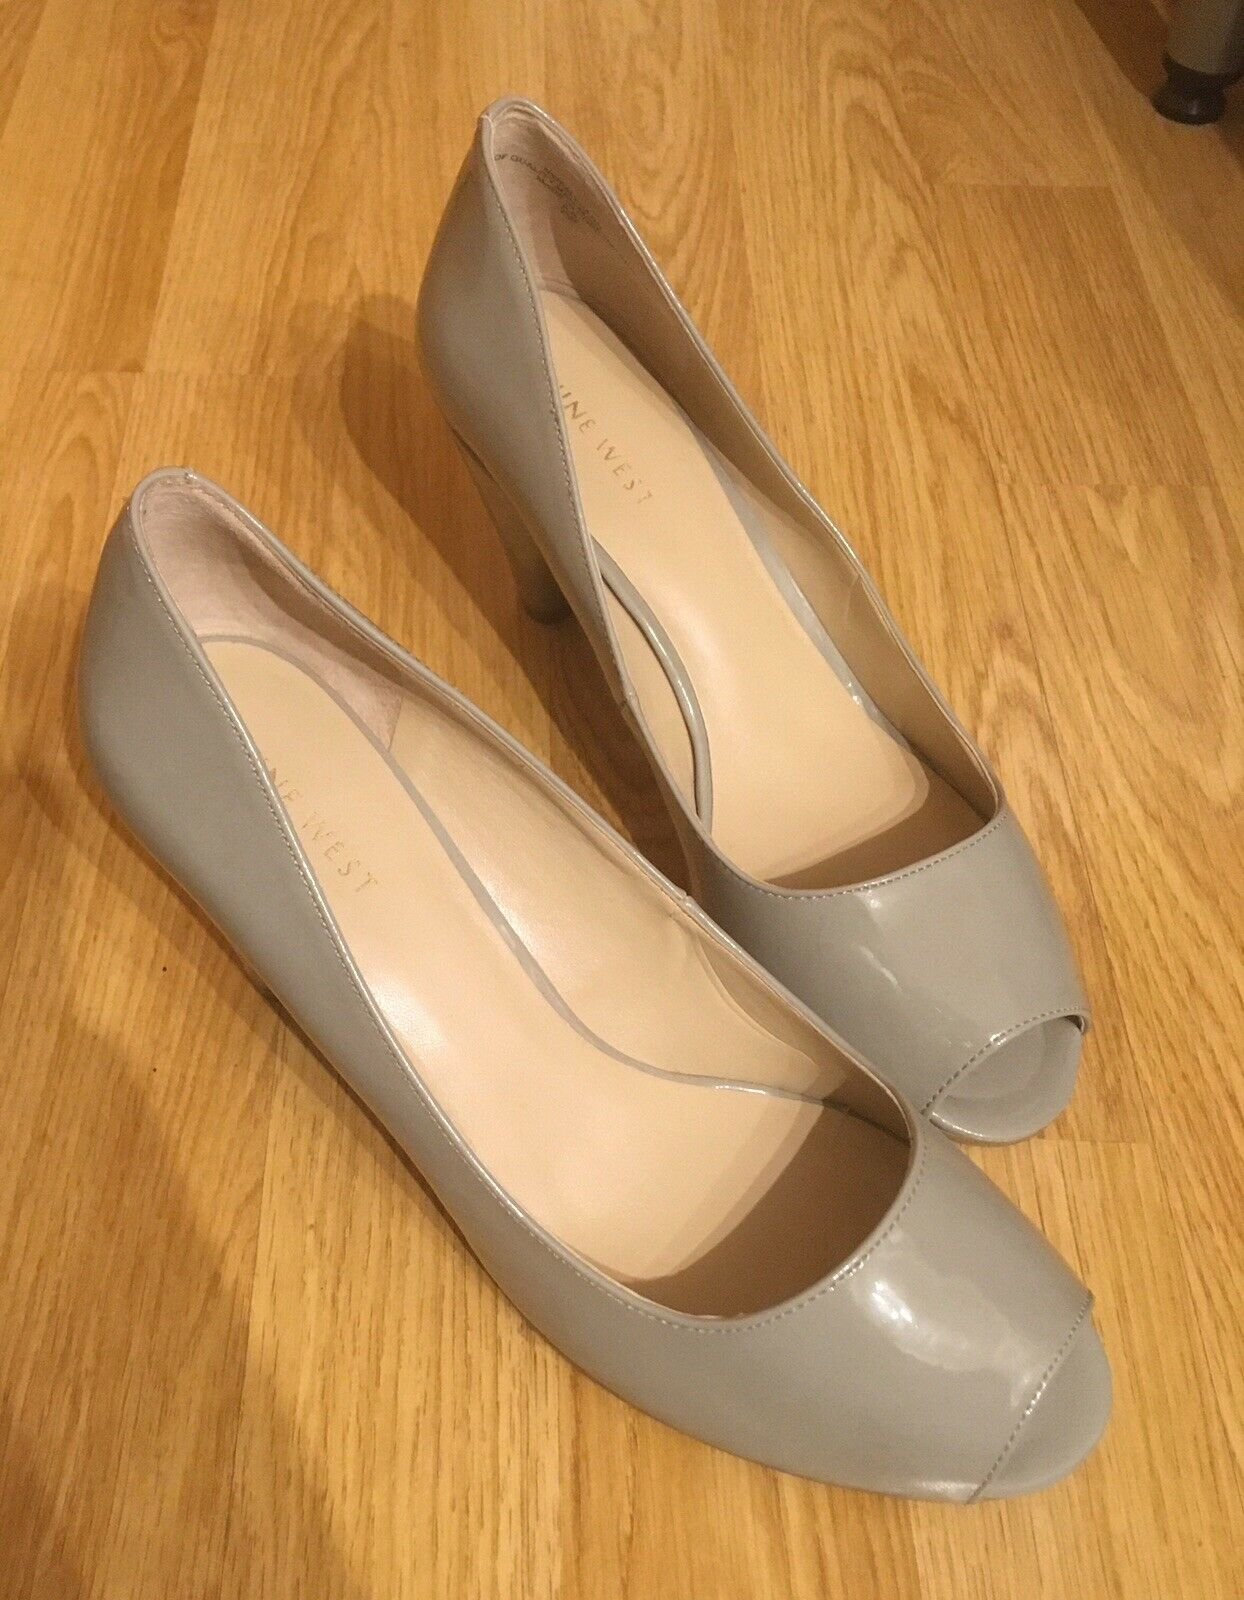 Grey/Light Patent Peep Toe Fallhard3 Heels By Nine West New With Box